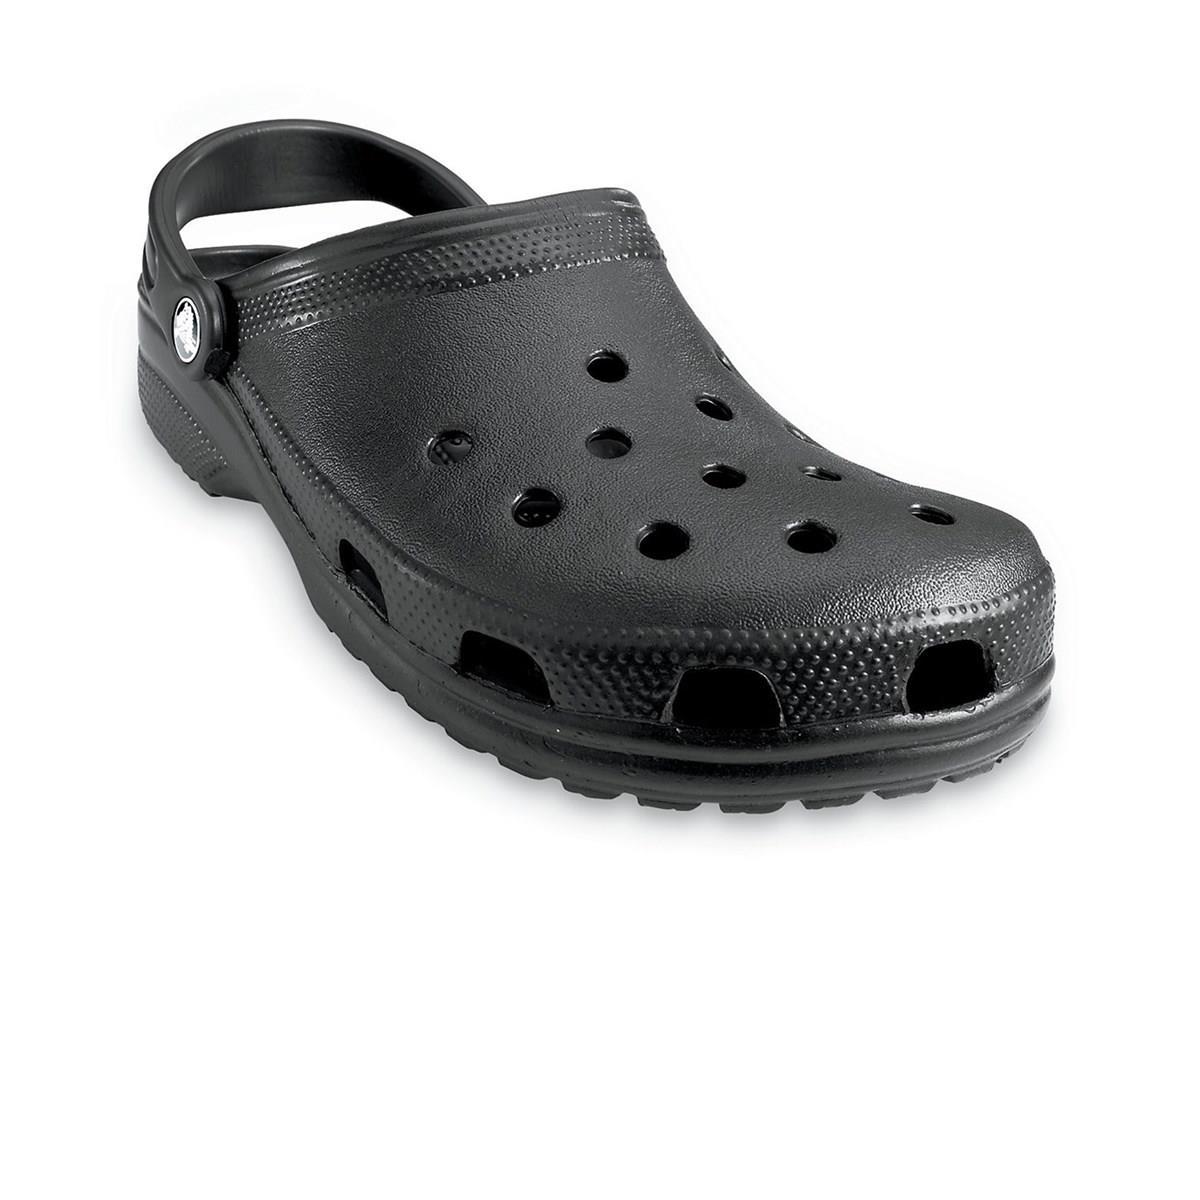 Crocs Original Classic Clogs P02254159